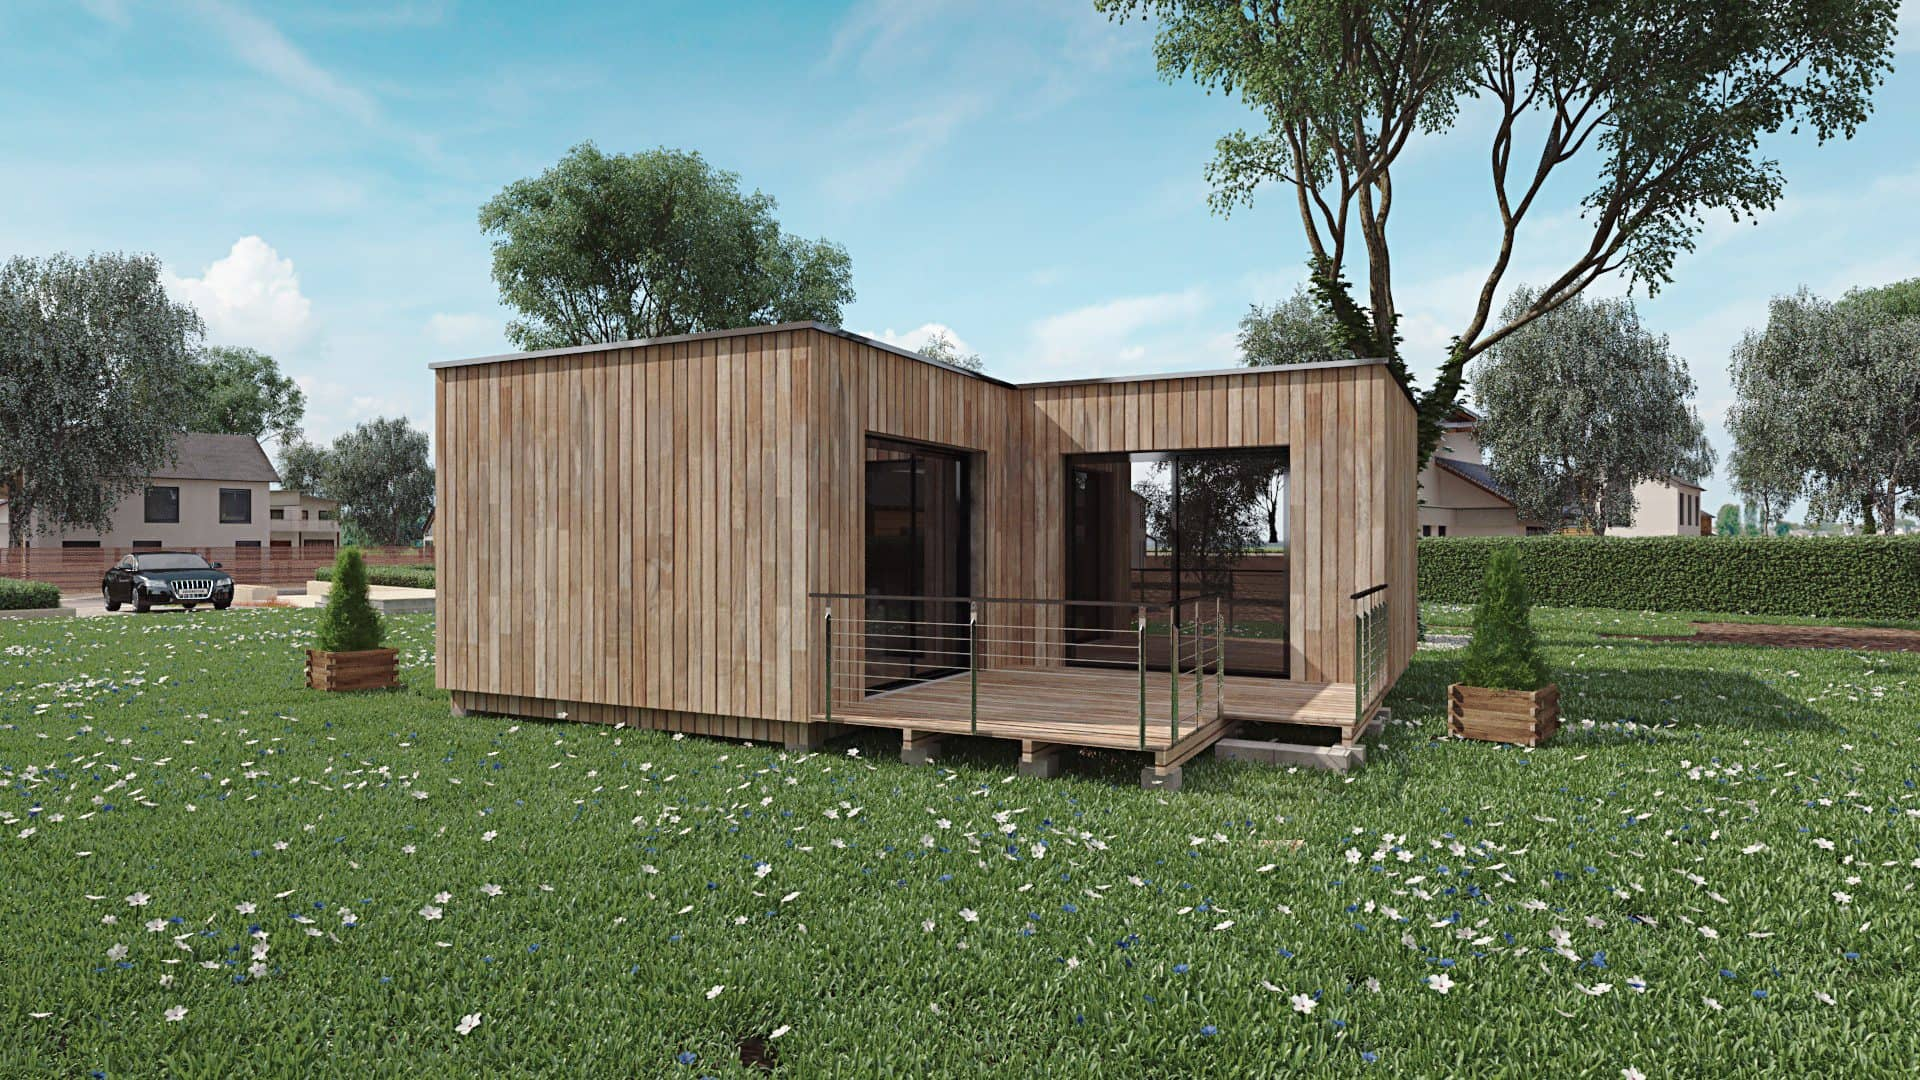 travailler son domicile dans un bureau de jardin cubelist. Black Bedroom Furniture Sets. Home Design Ideas